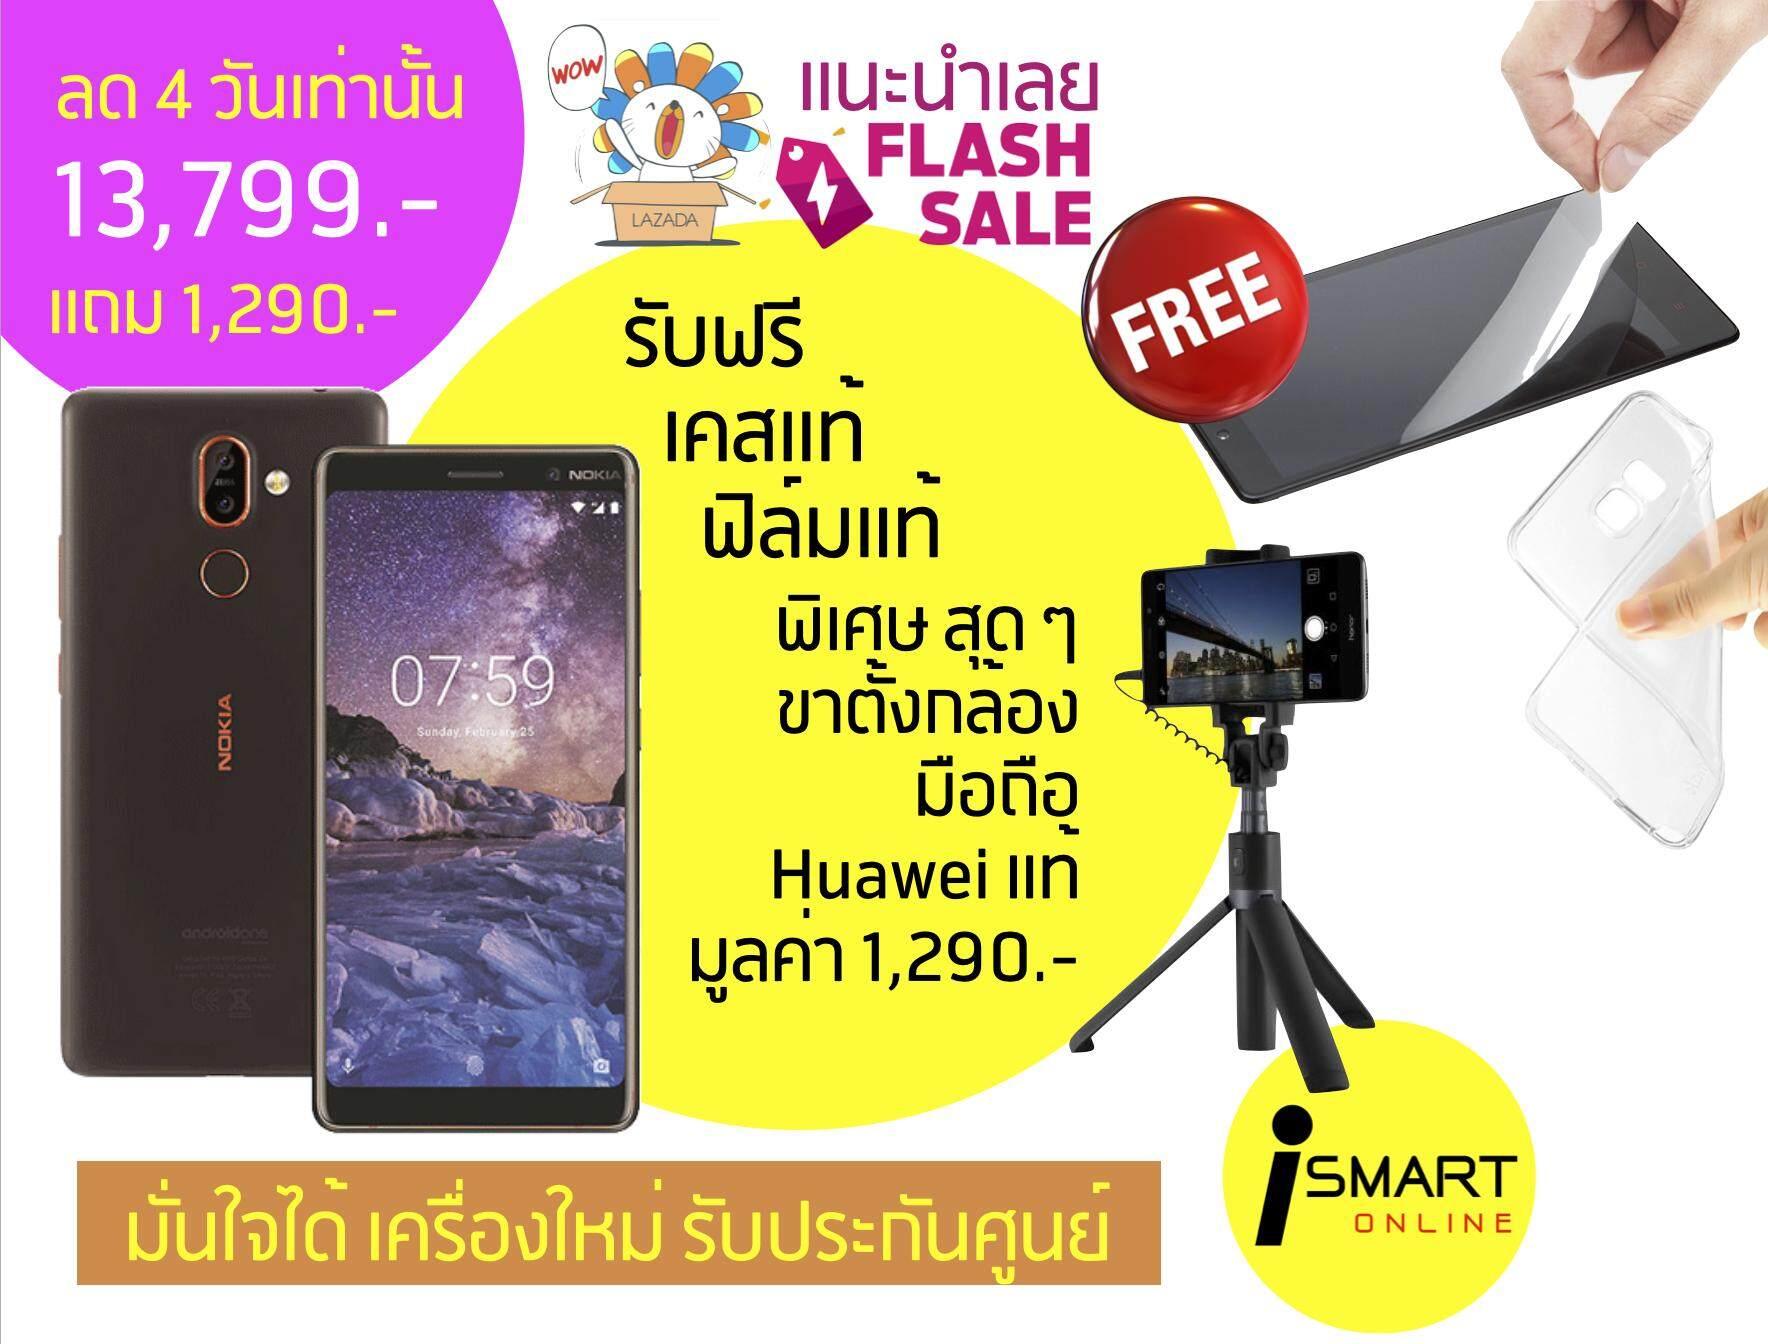 Nokia 7 Plus ลดเหลือ 13,799 บาท กดโค๊ต ismart10 รับฟรี ขาตั้งกล้องมือถือ Huawei แท้ มูลค่า 1290.- +เคสแท้+ฟิล์มกันรอยแท้